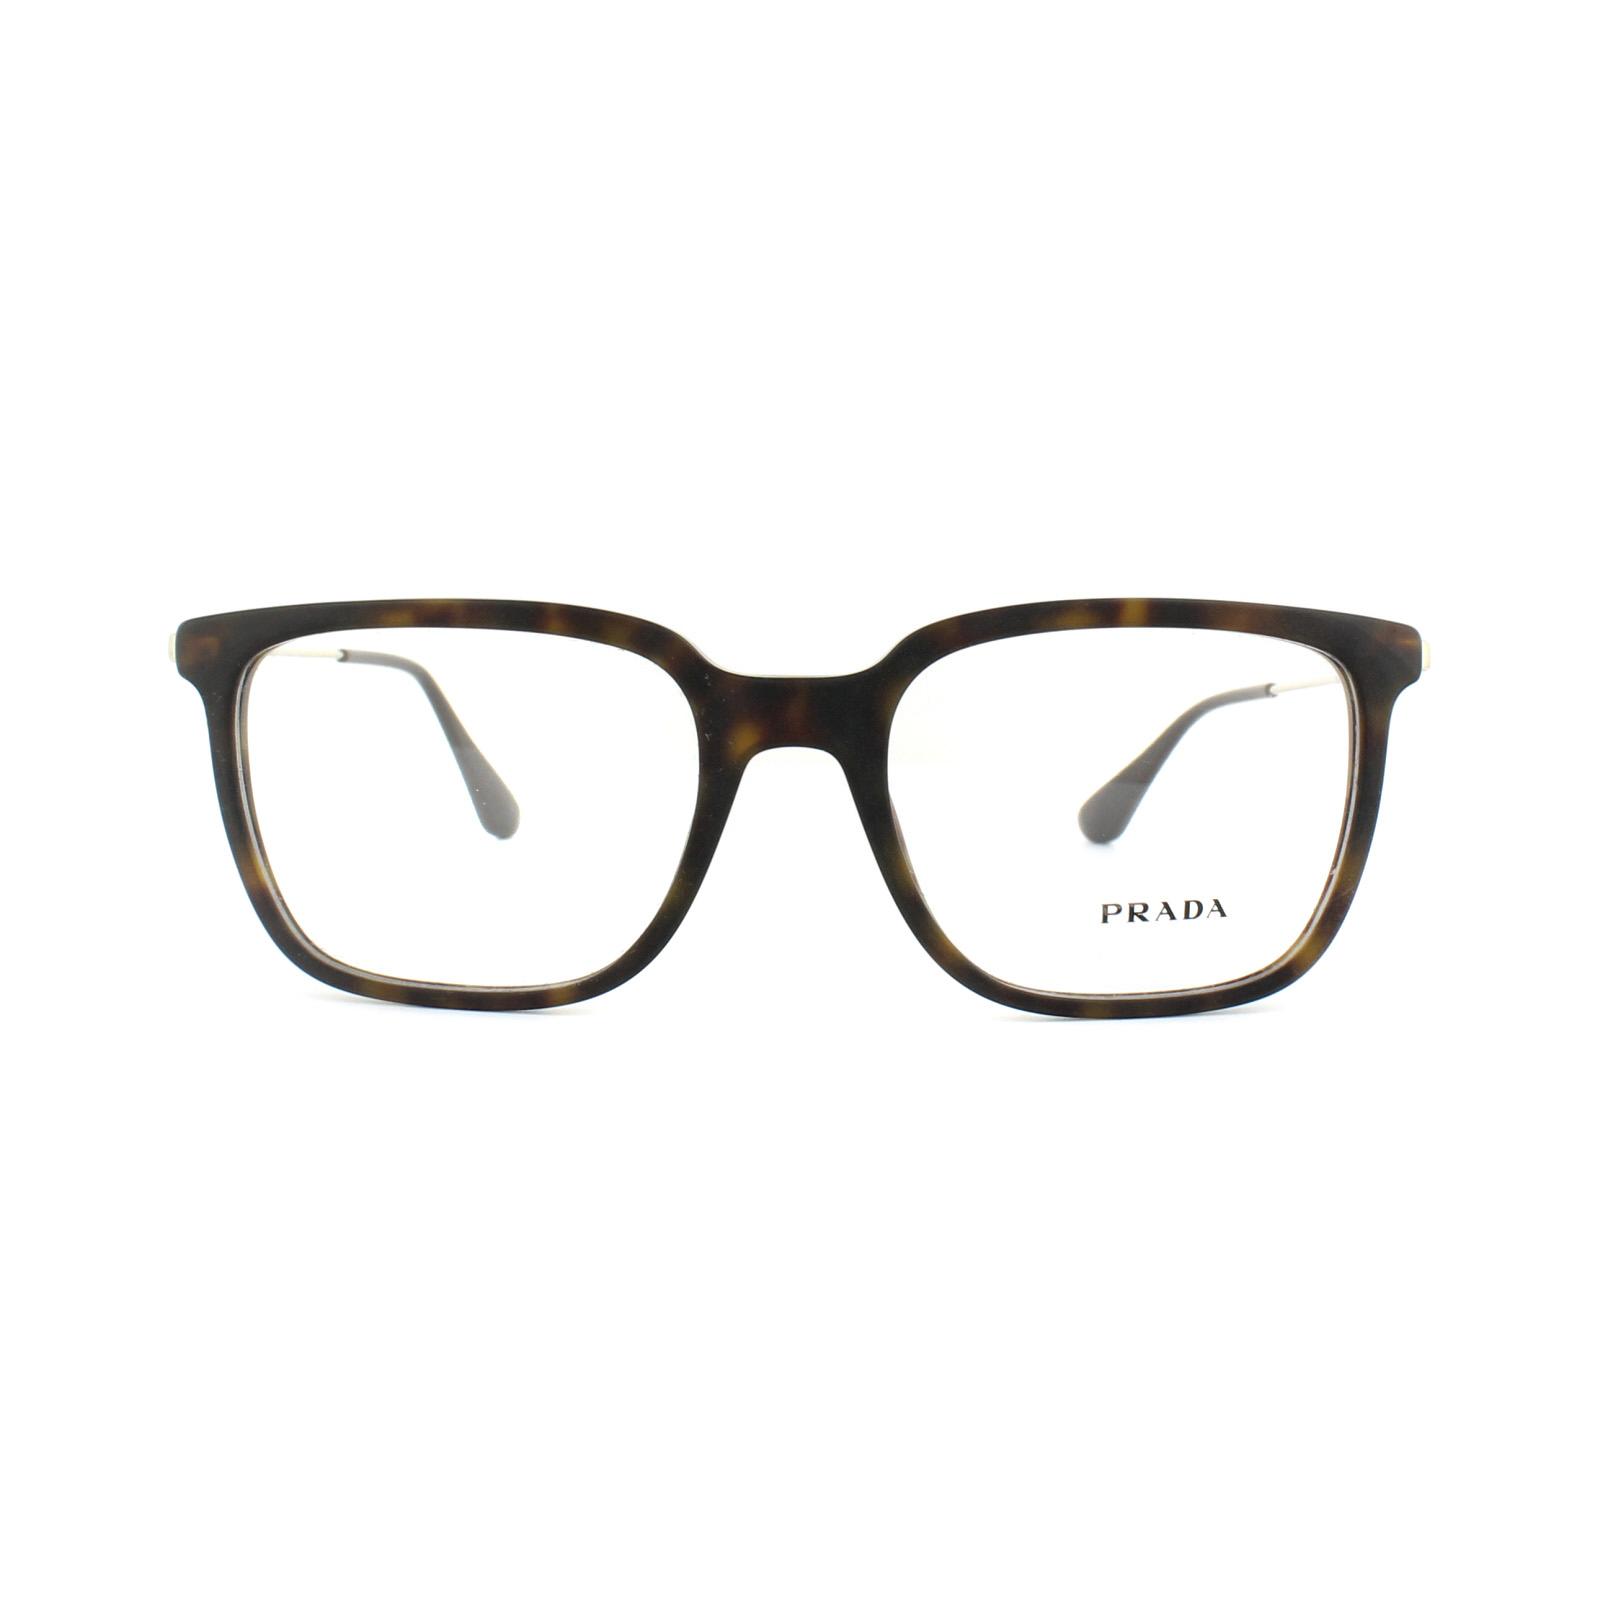 126fc973b2 Cheap Prada PR 17TV Glasses Frames - Discounted Sunglasses